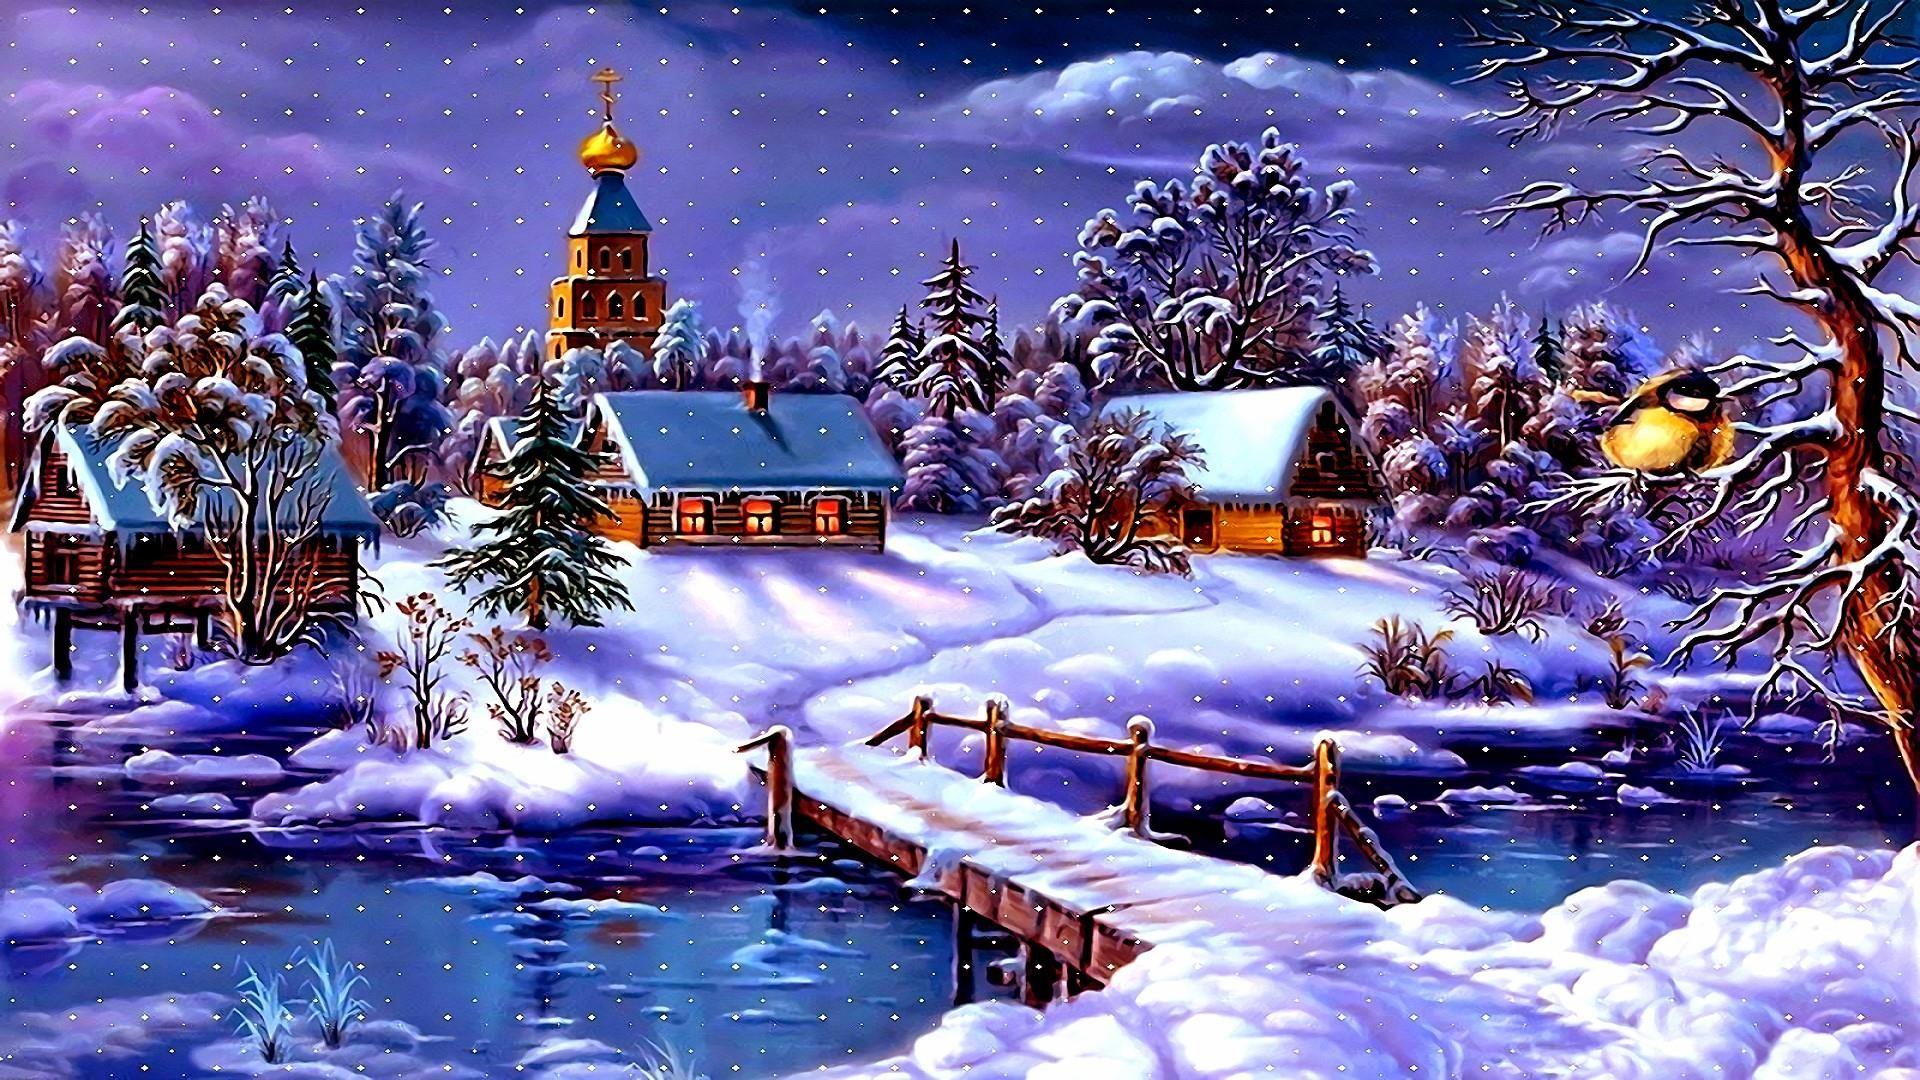 Live 3d Wallpaper Snowing Christmas Village Wallpaper 55 Pictures